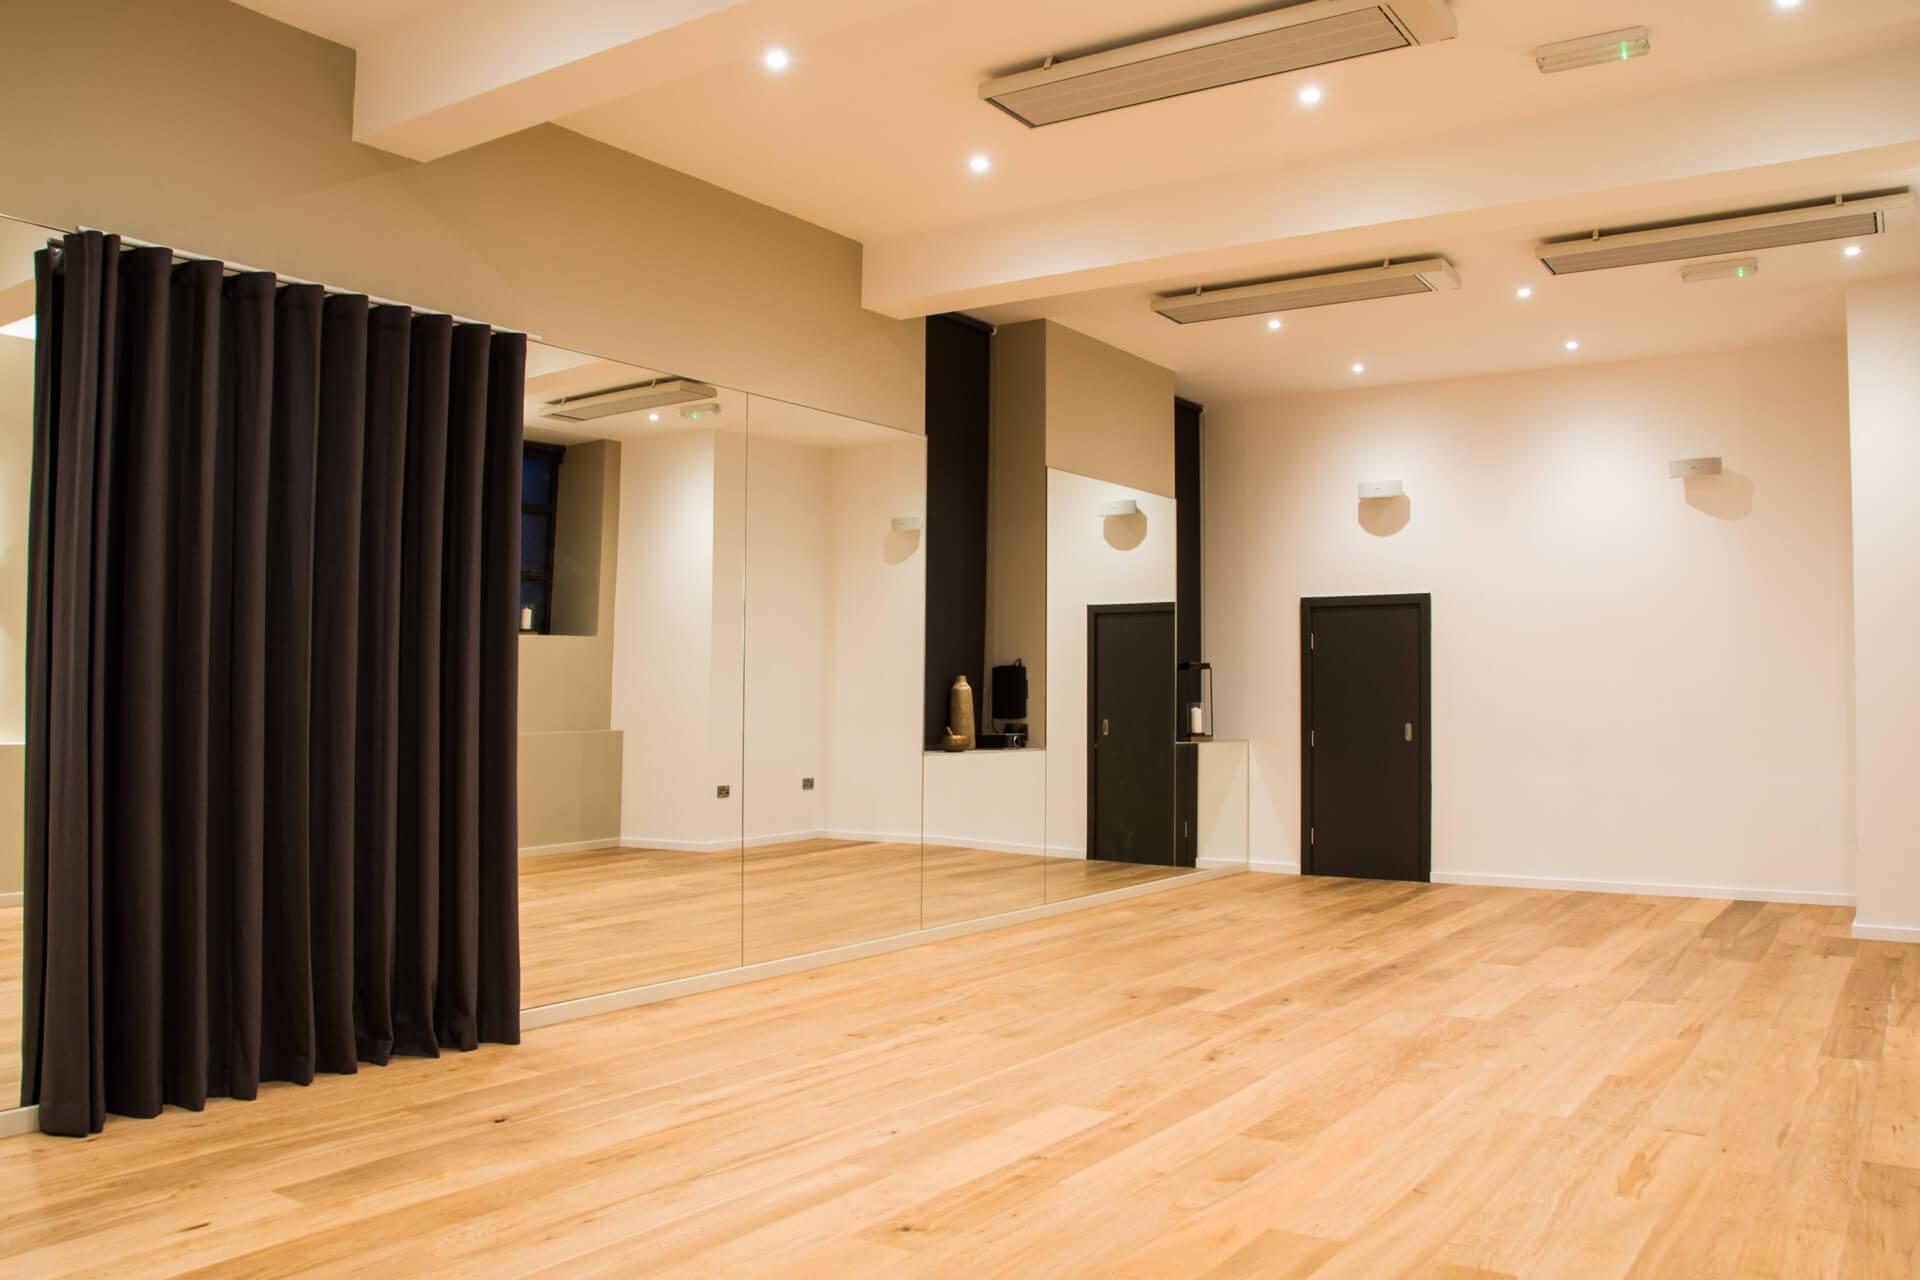 Be Yoga Space studio in lights